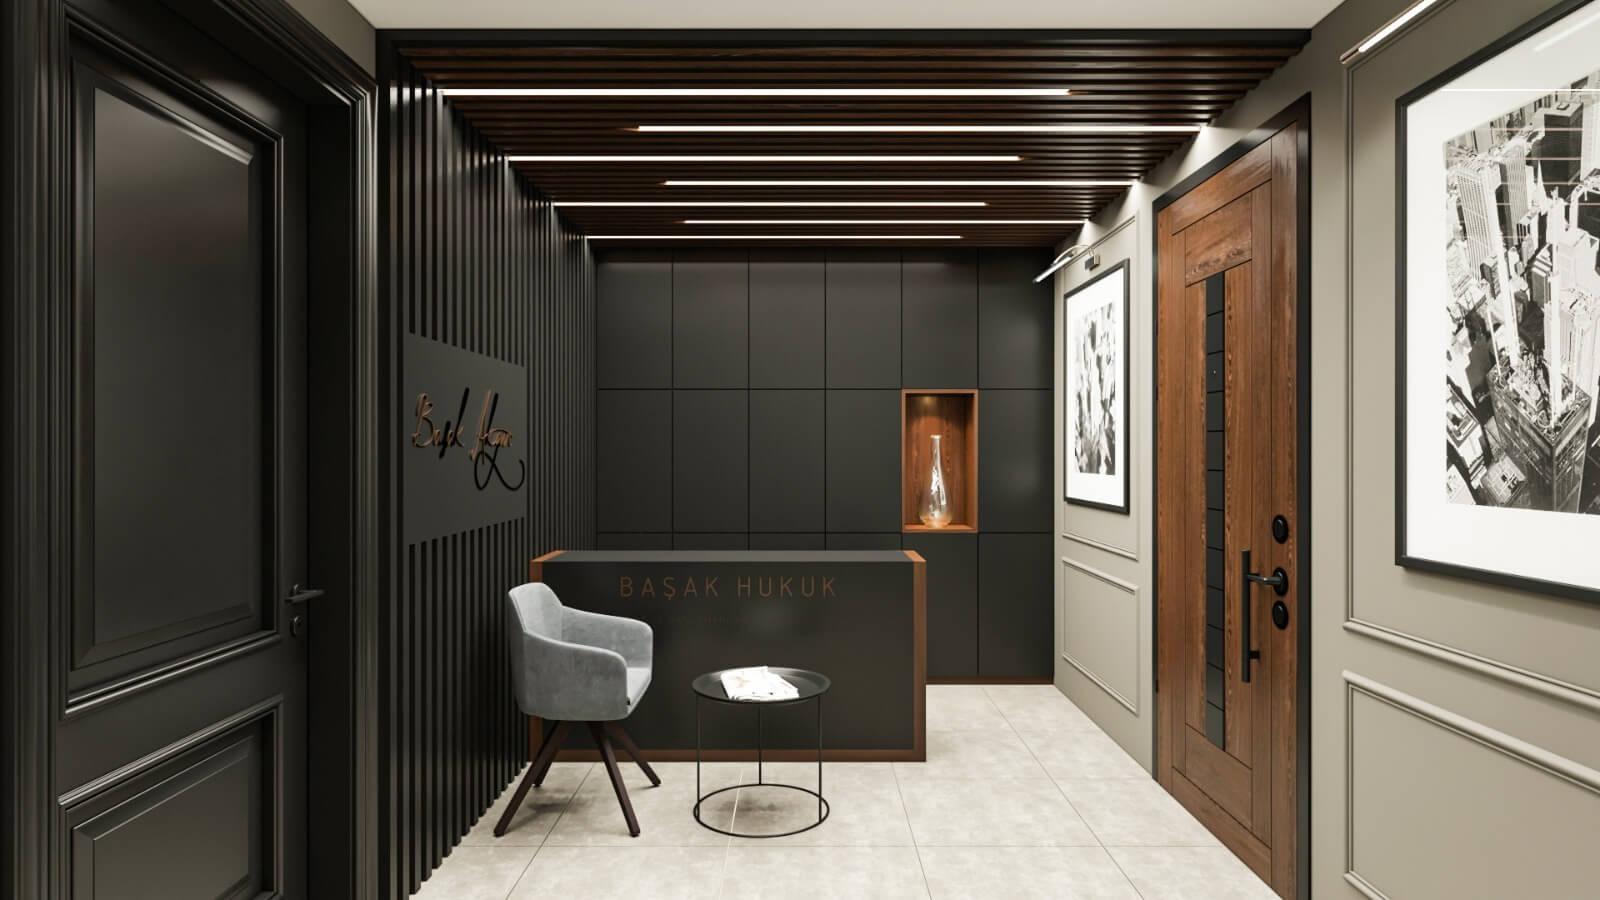 office design 4044 Basak AKGUN LAW Offices